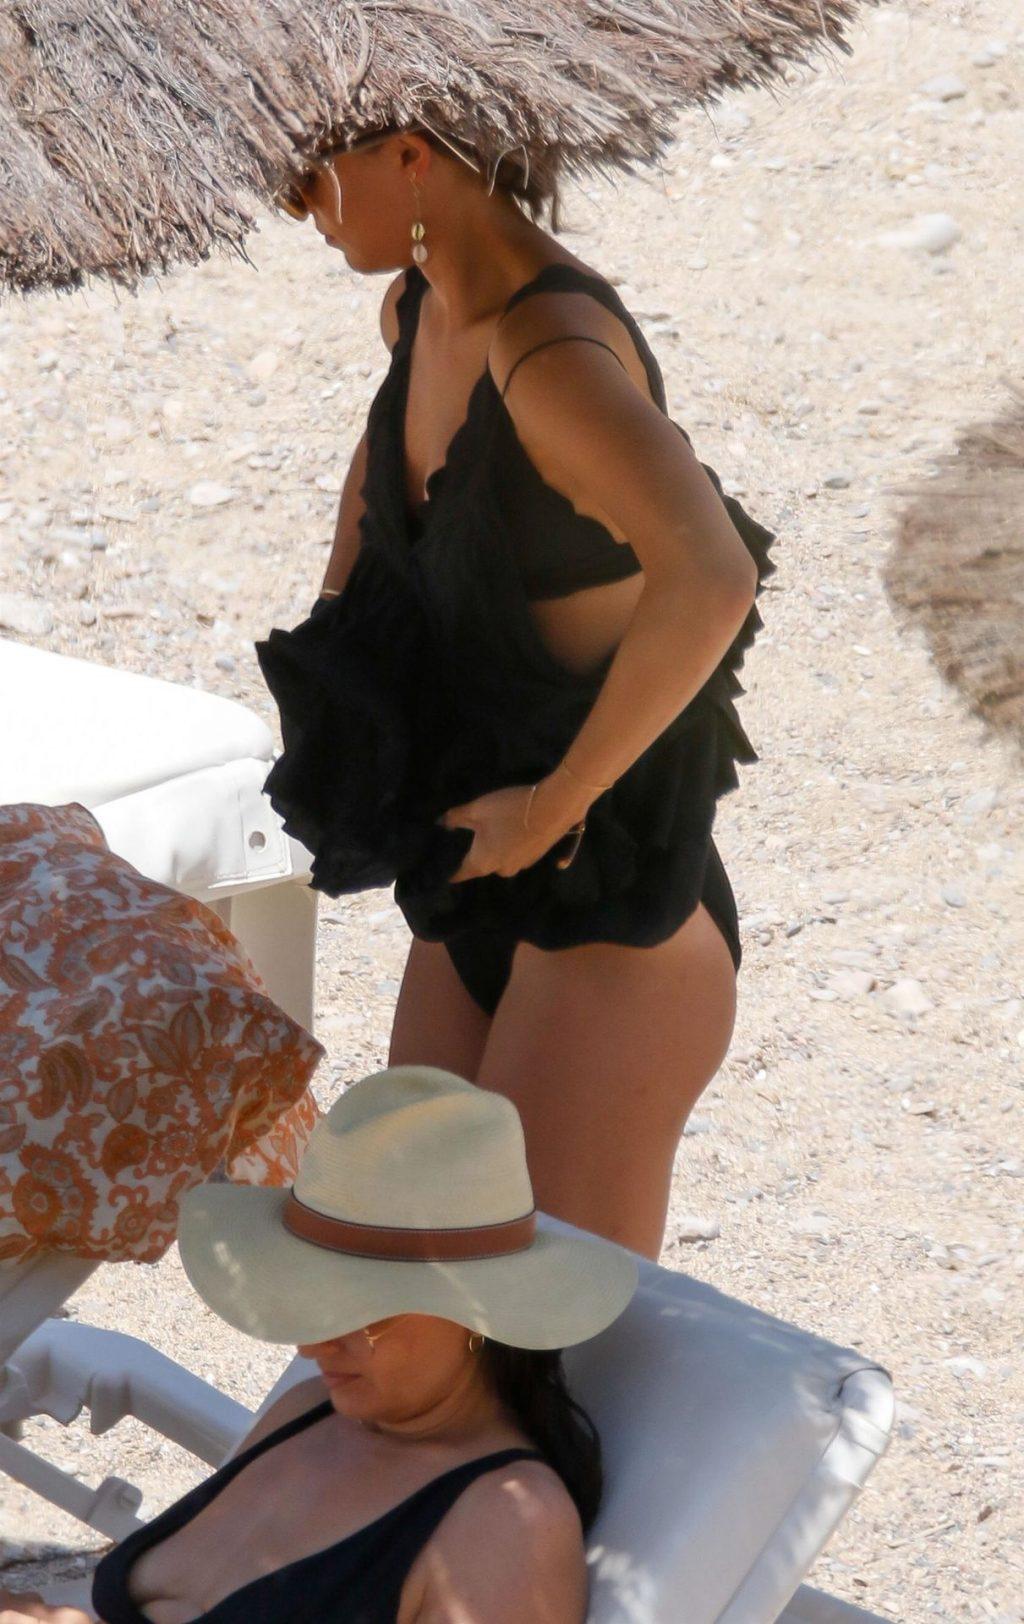 Alicia Vikander Shows Off Her Amazing Bikini Body on the Beach in Ibiza (85 Photos)